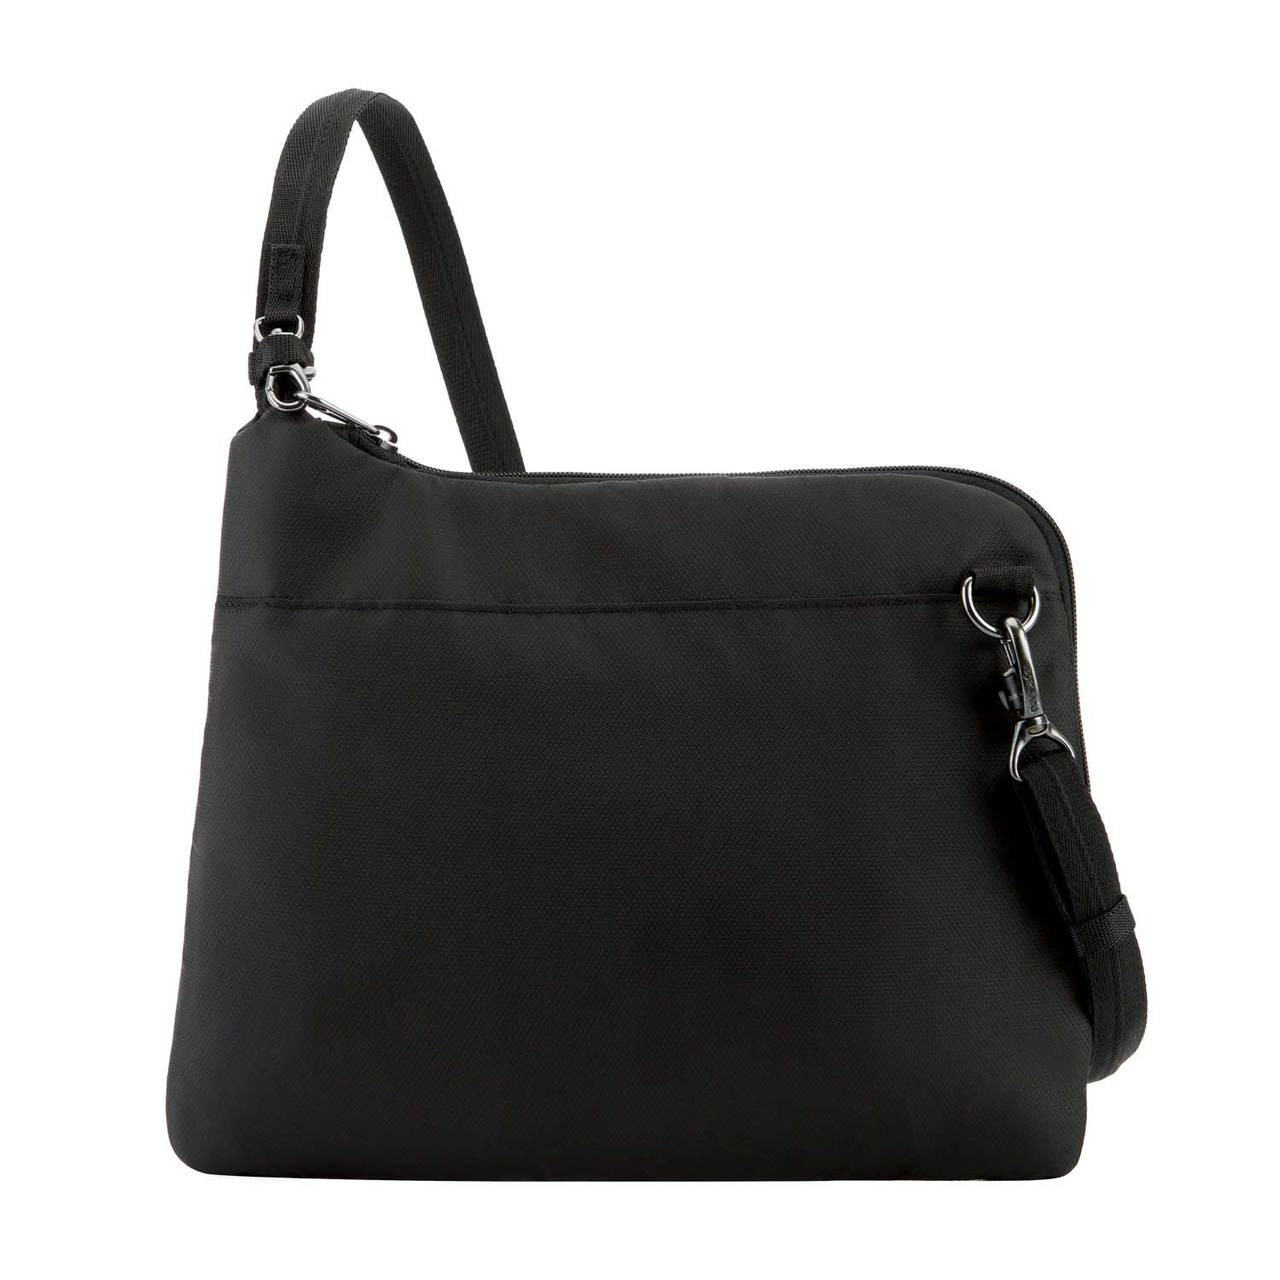 Pacsafe Daysafe Blackberry Anti theft Tech Crossbody Bag w Slashguard Straps